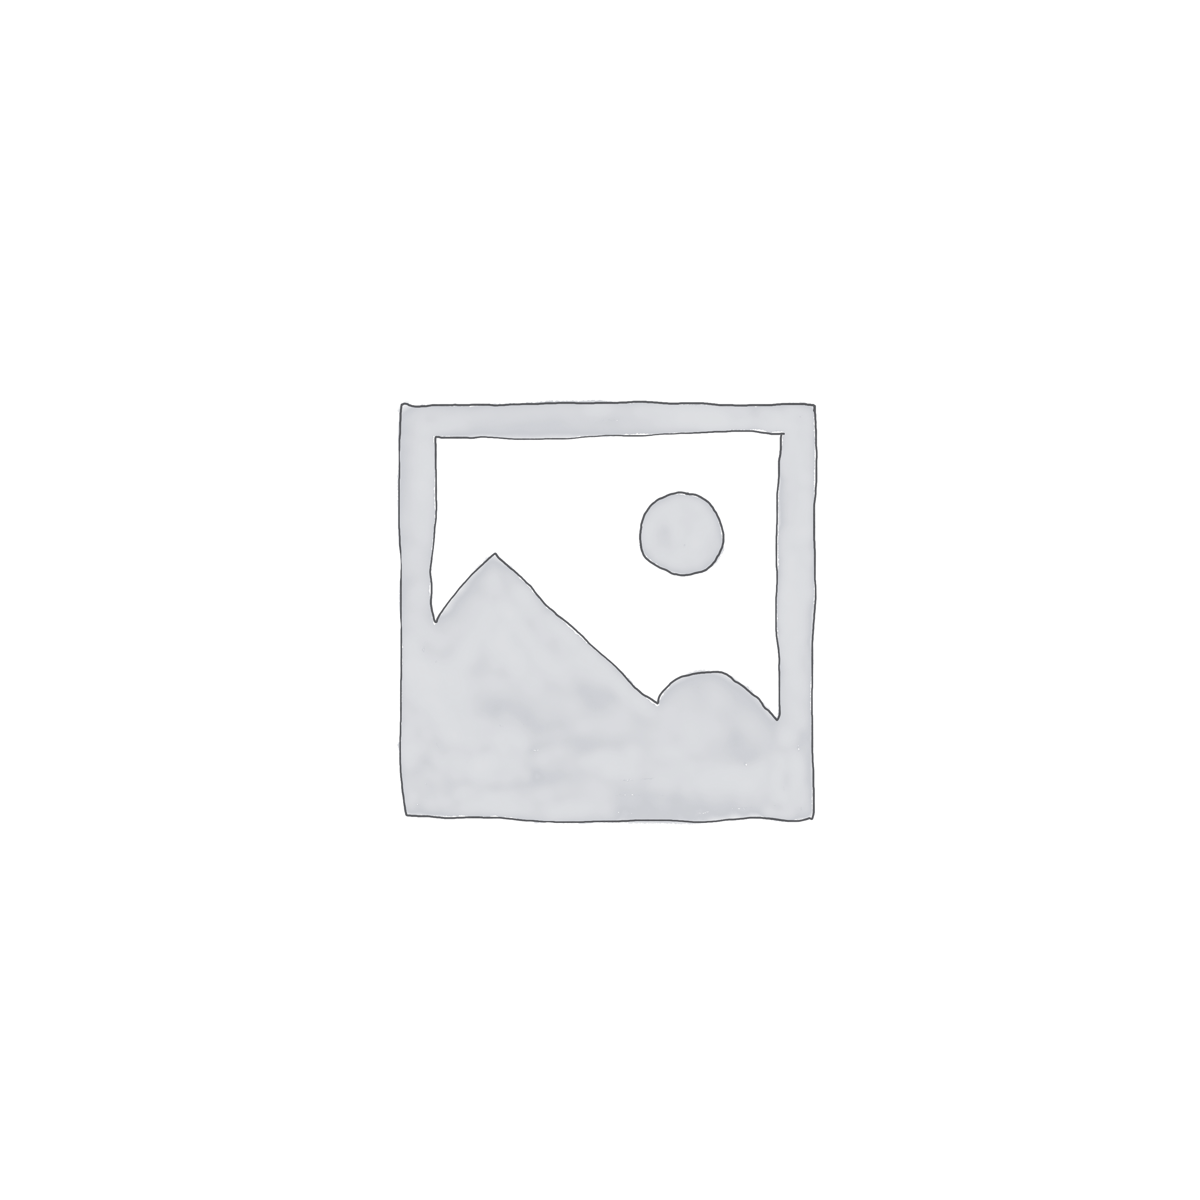 ROG Zephyrus M GU501GM